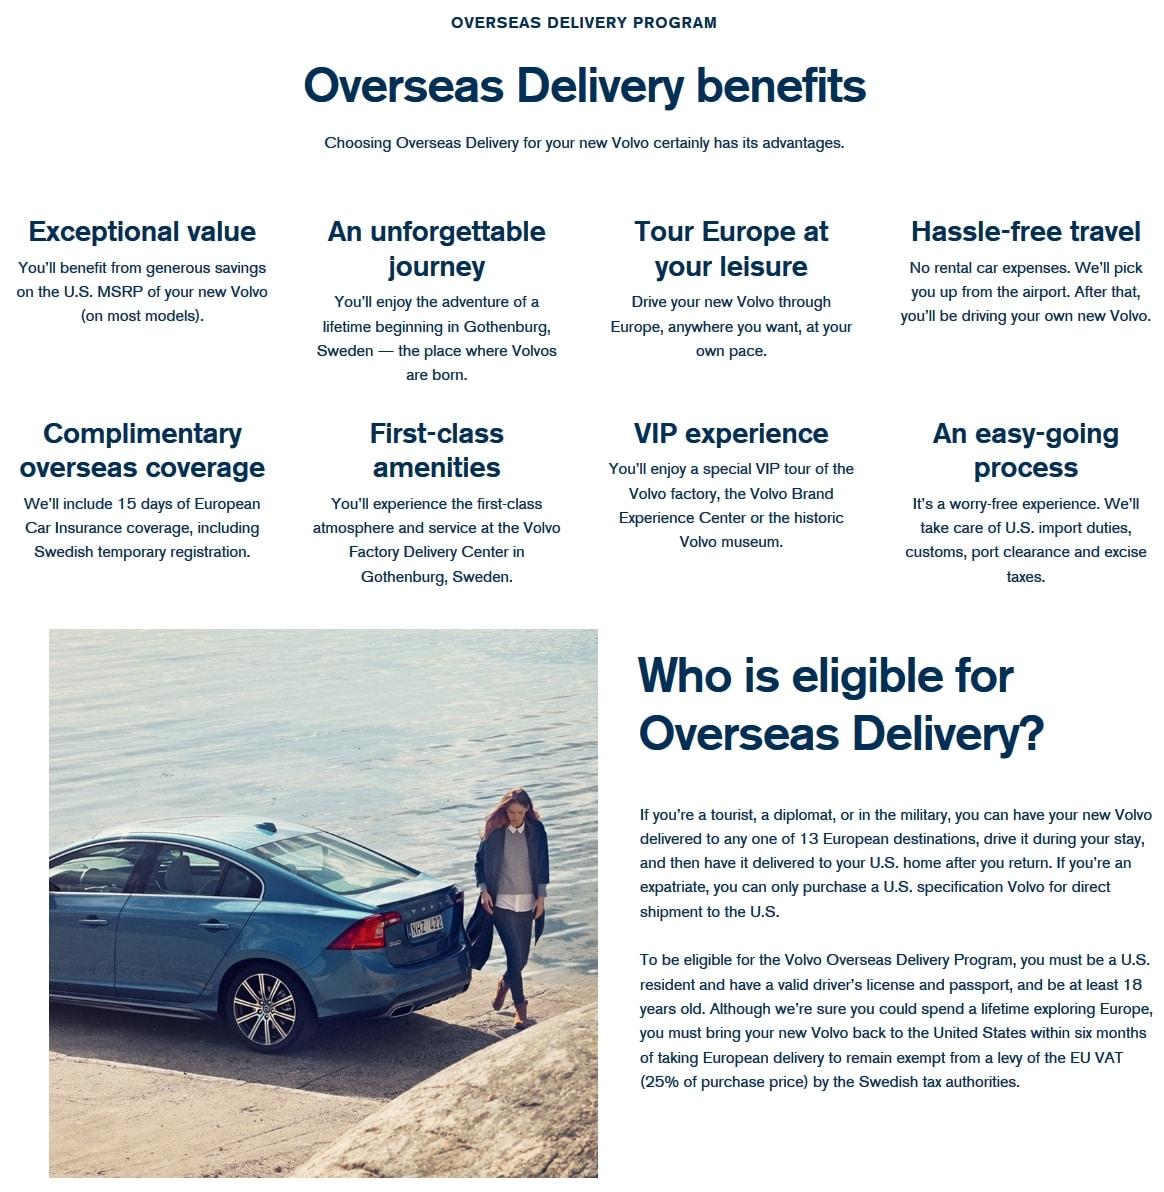 Volvo Overseas Delivery: Volvo Overseas Delivery Program